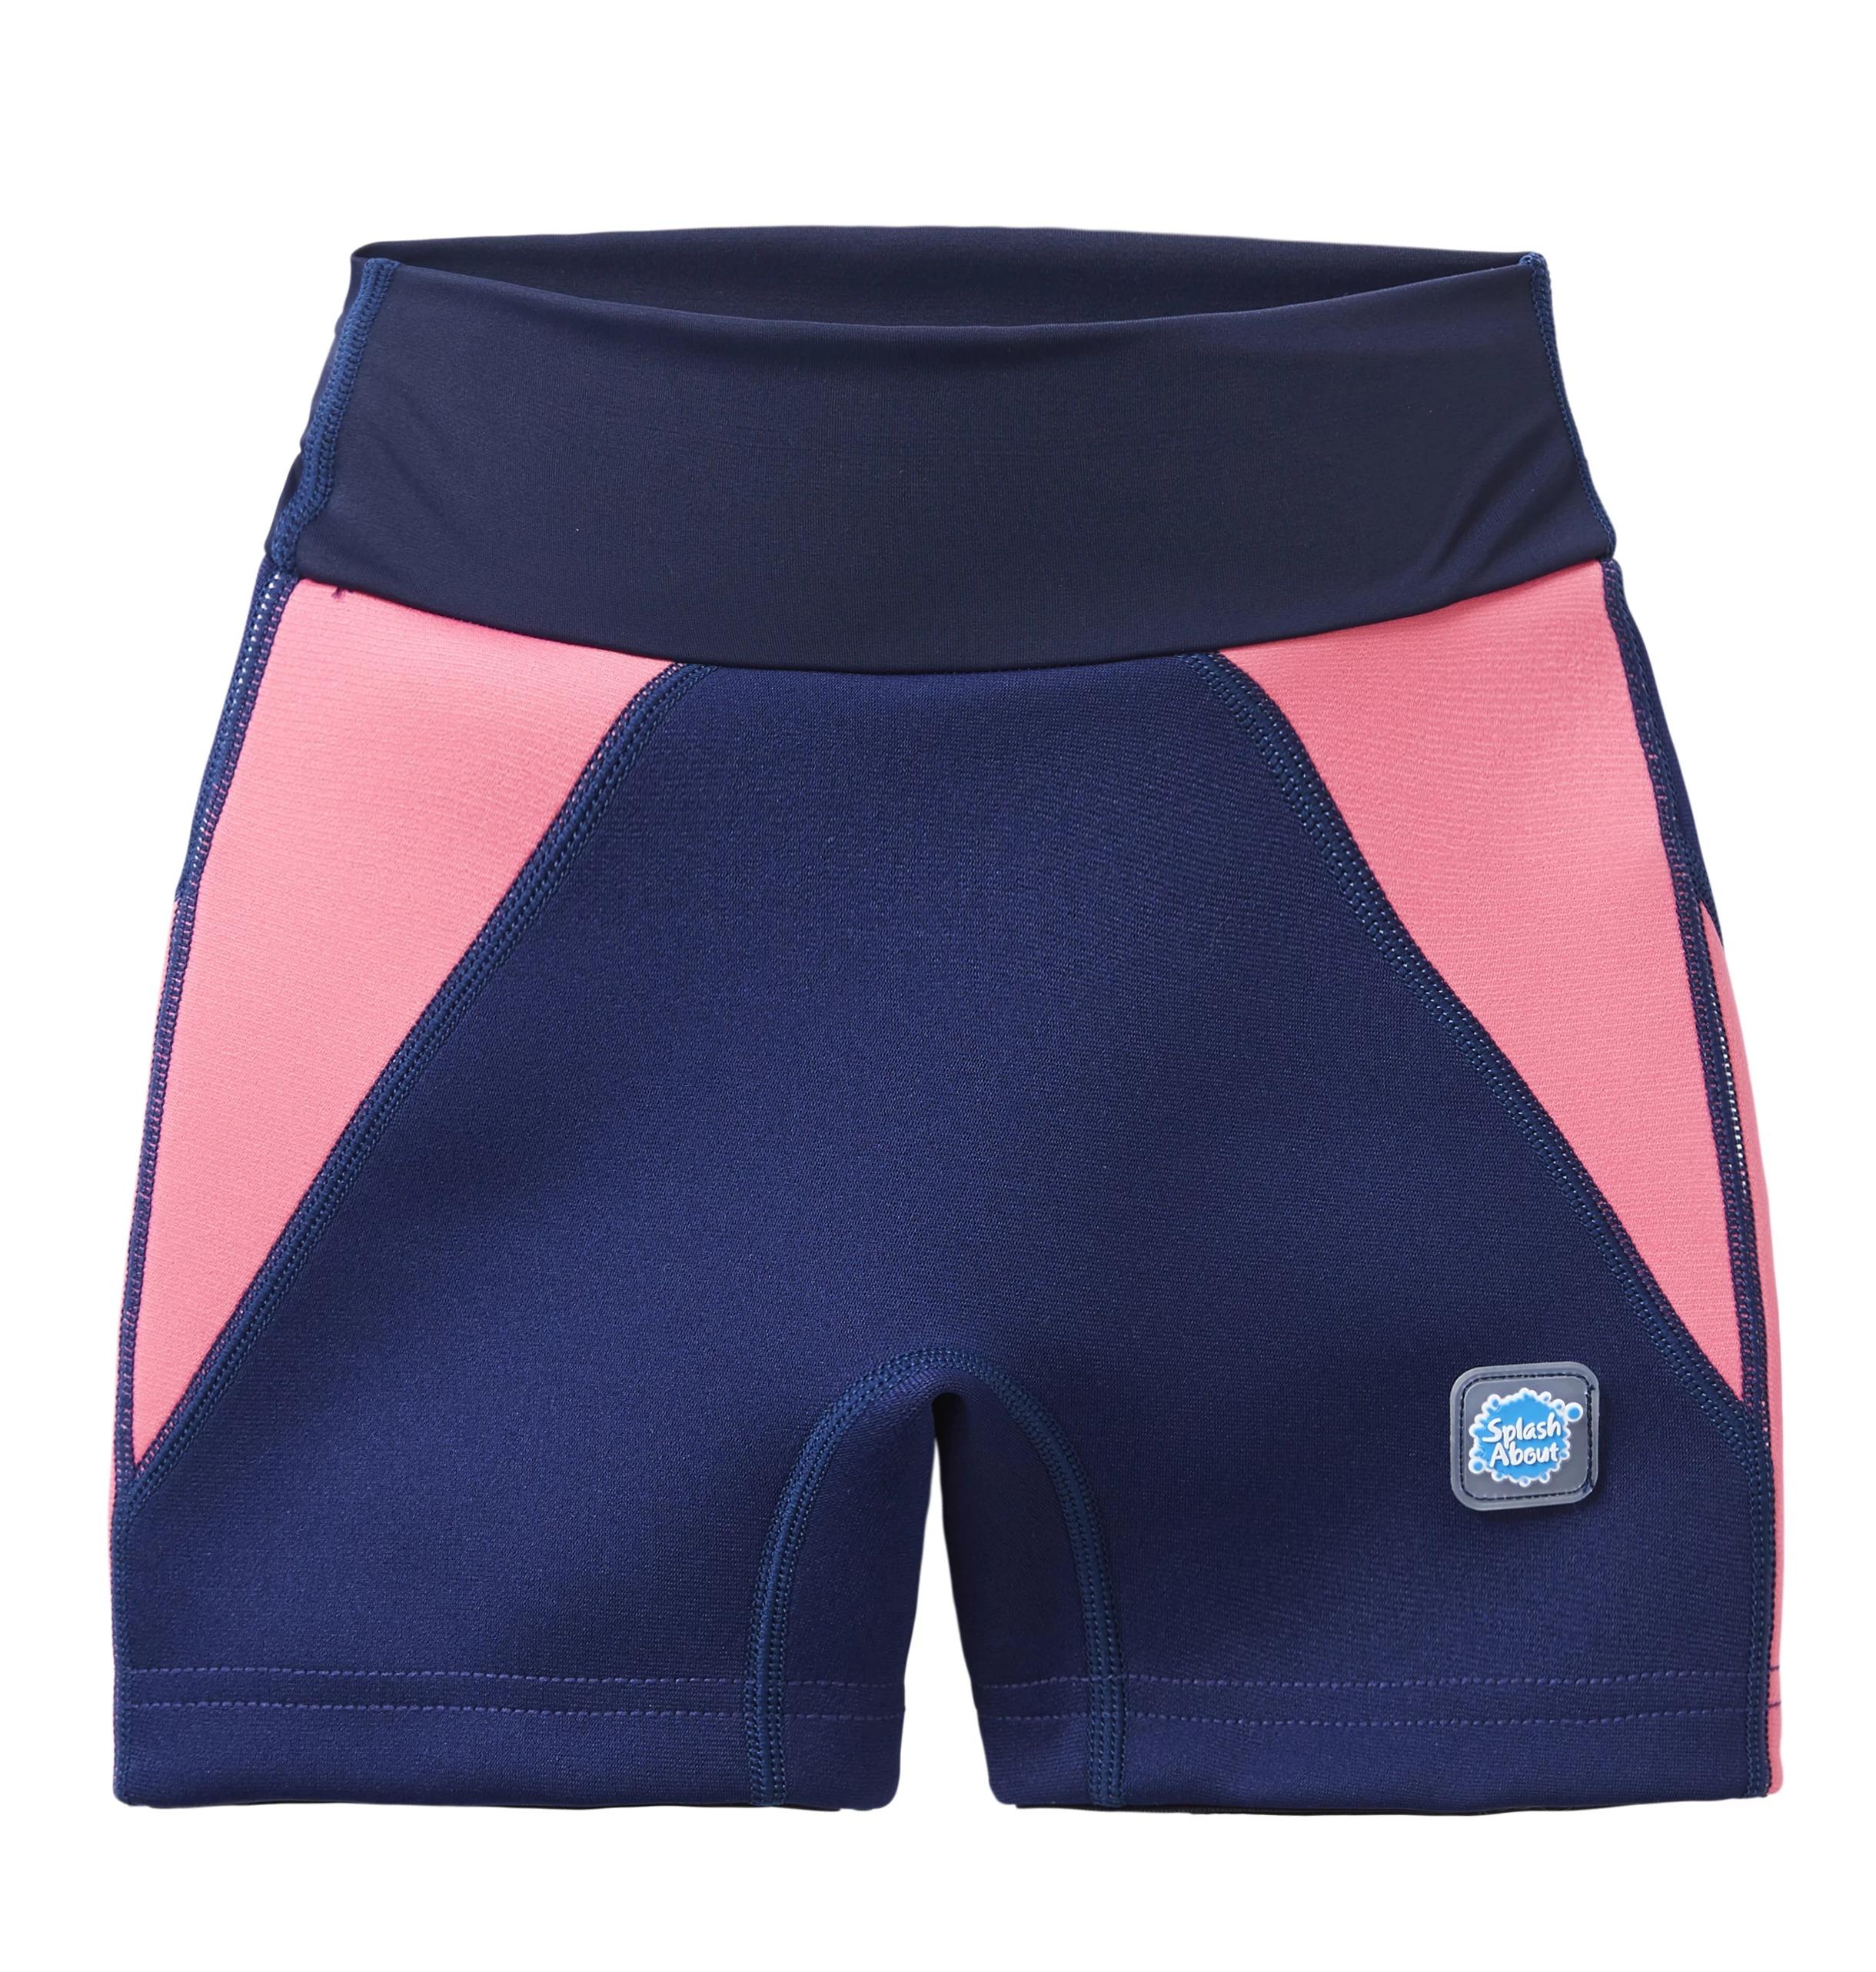 Short de Baño Antifugas Splash Jammers Azul/Rosado